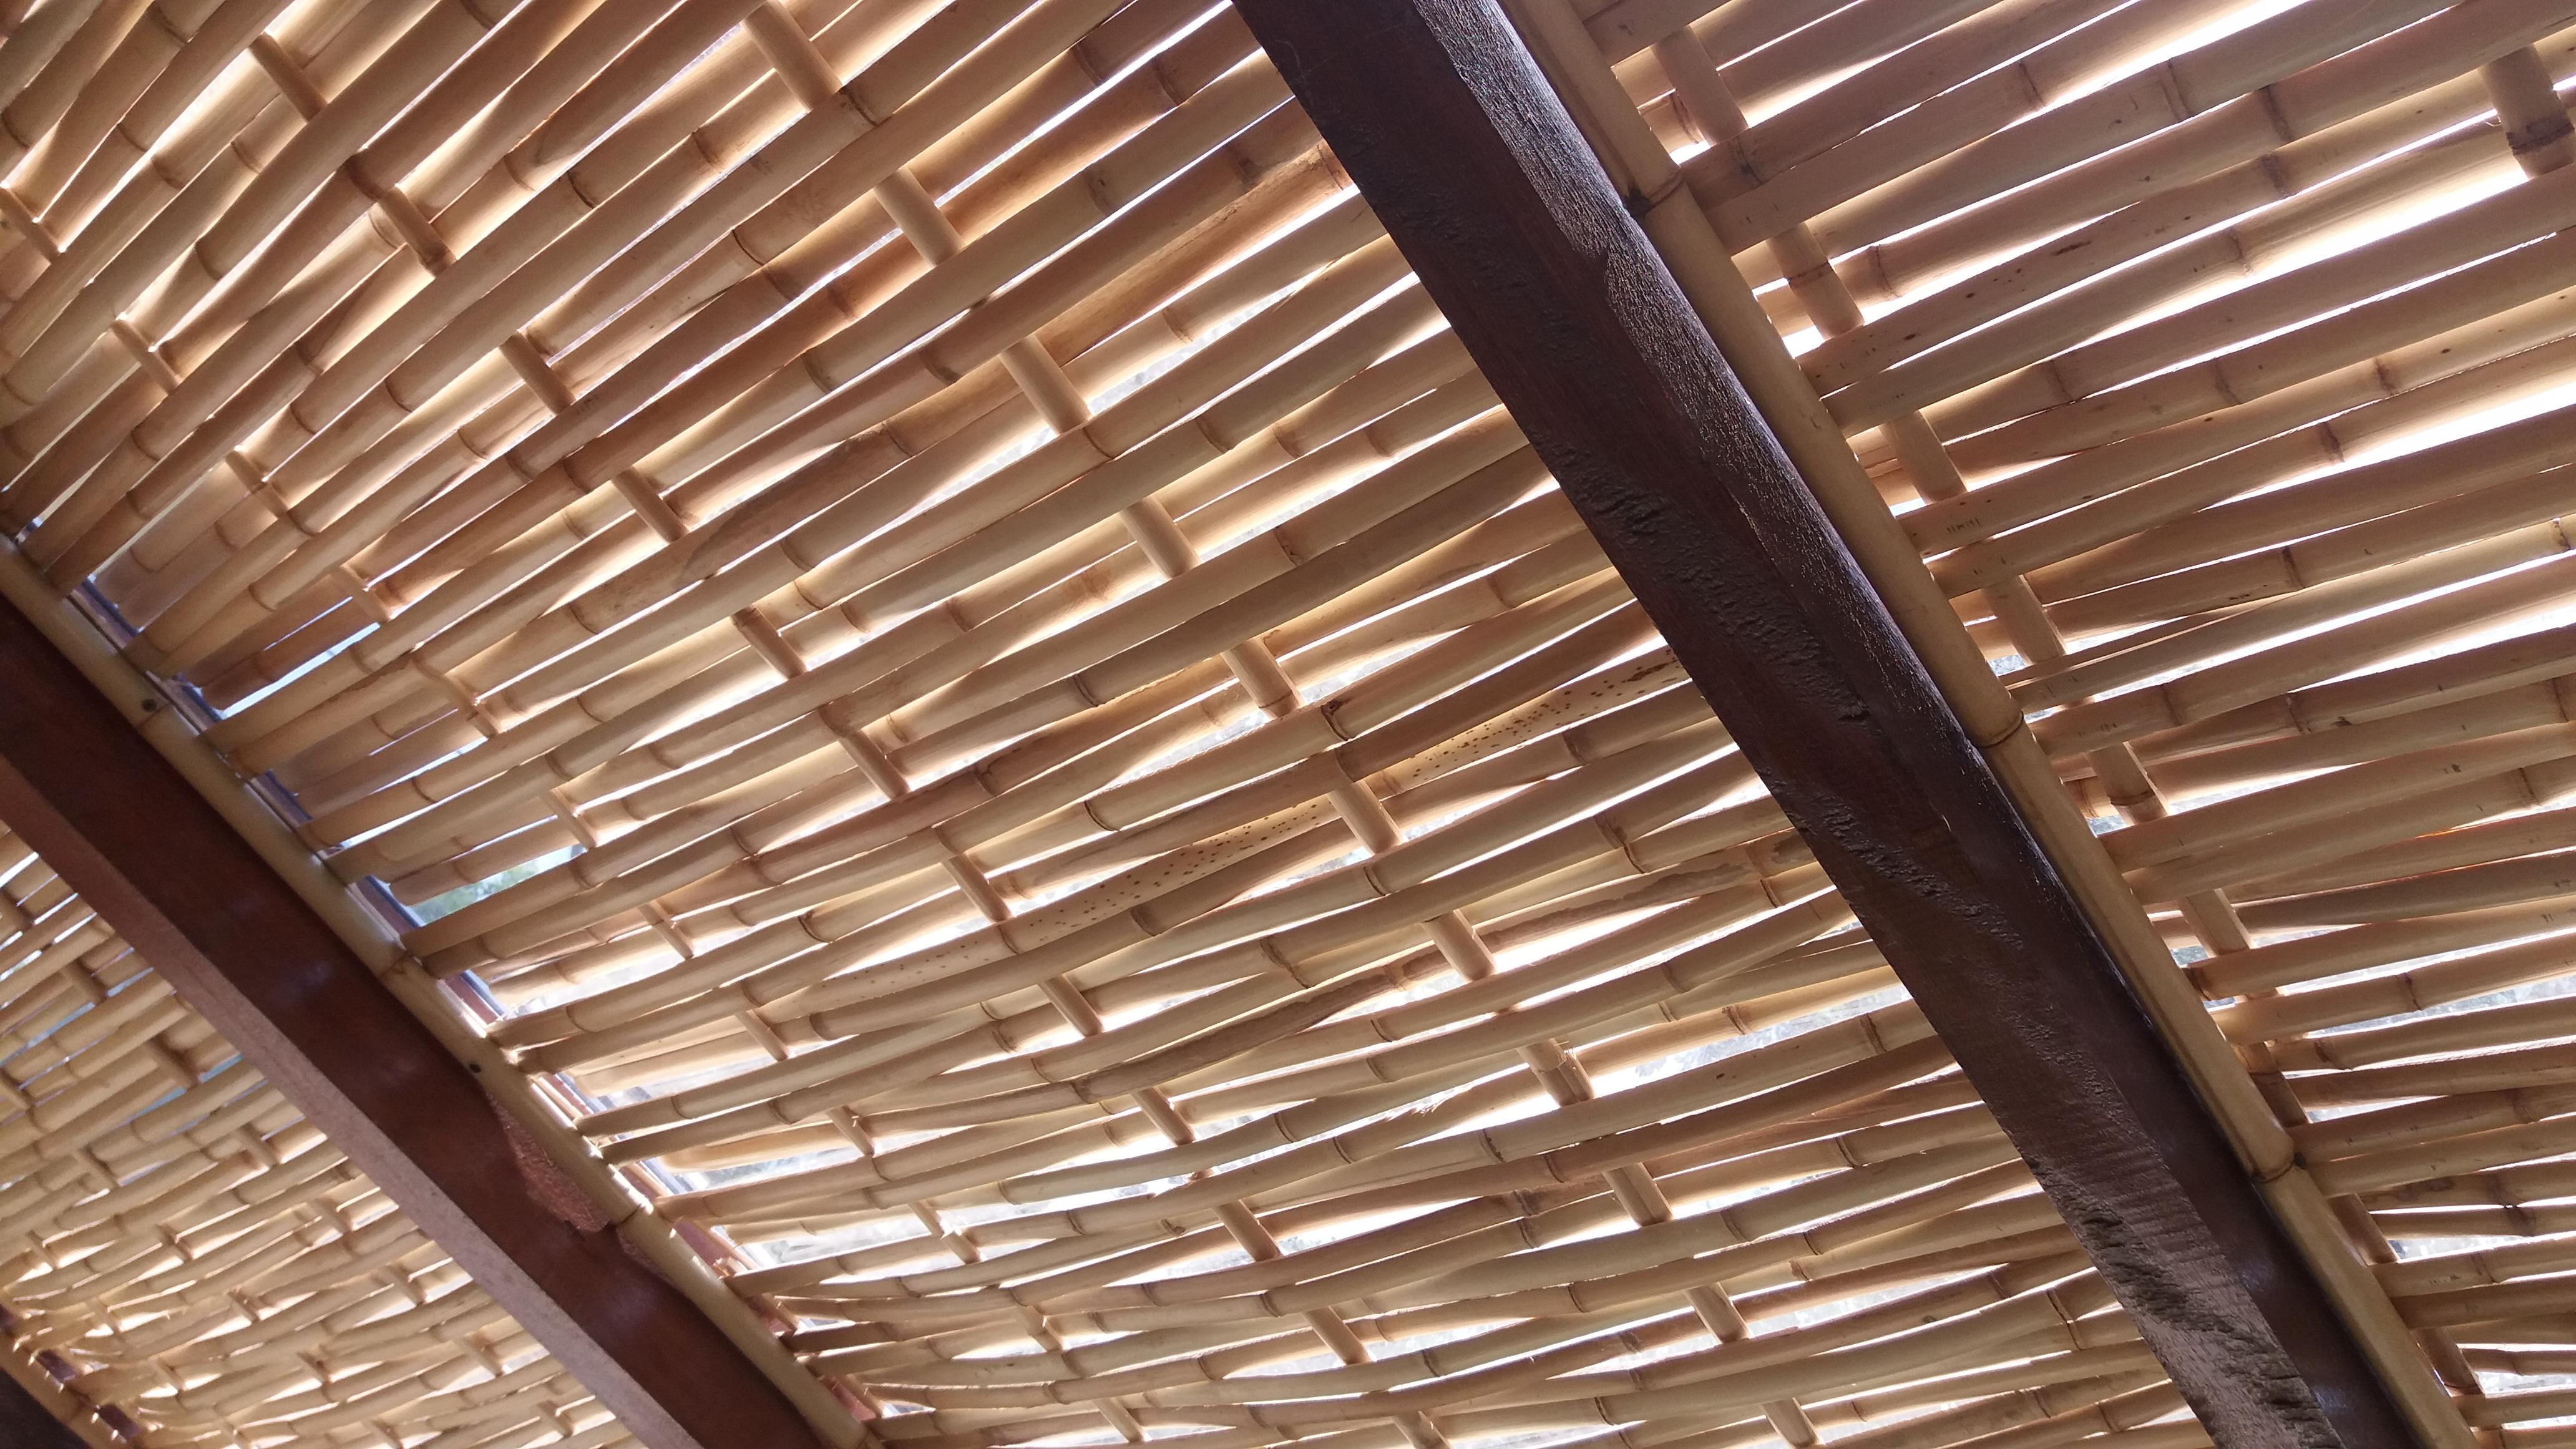 forro de palha de bambu